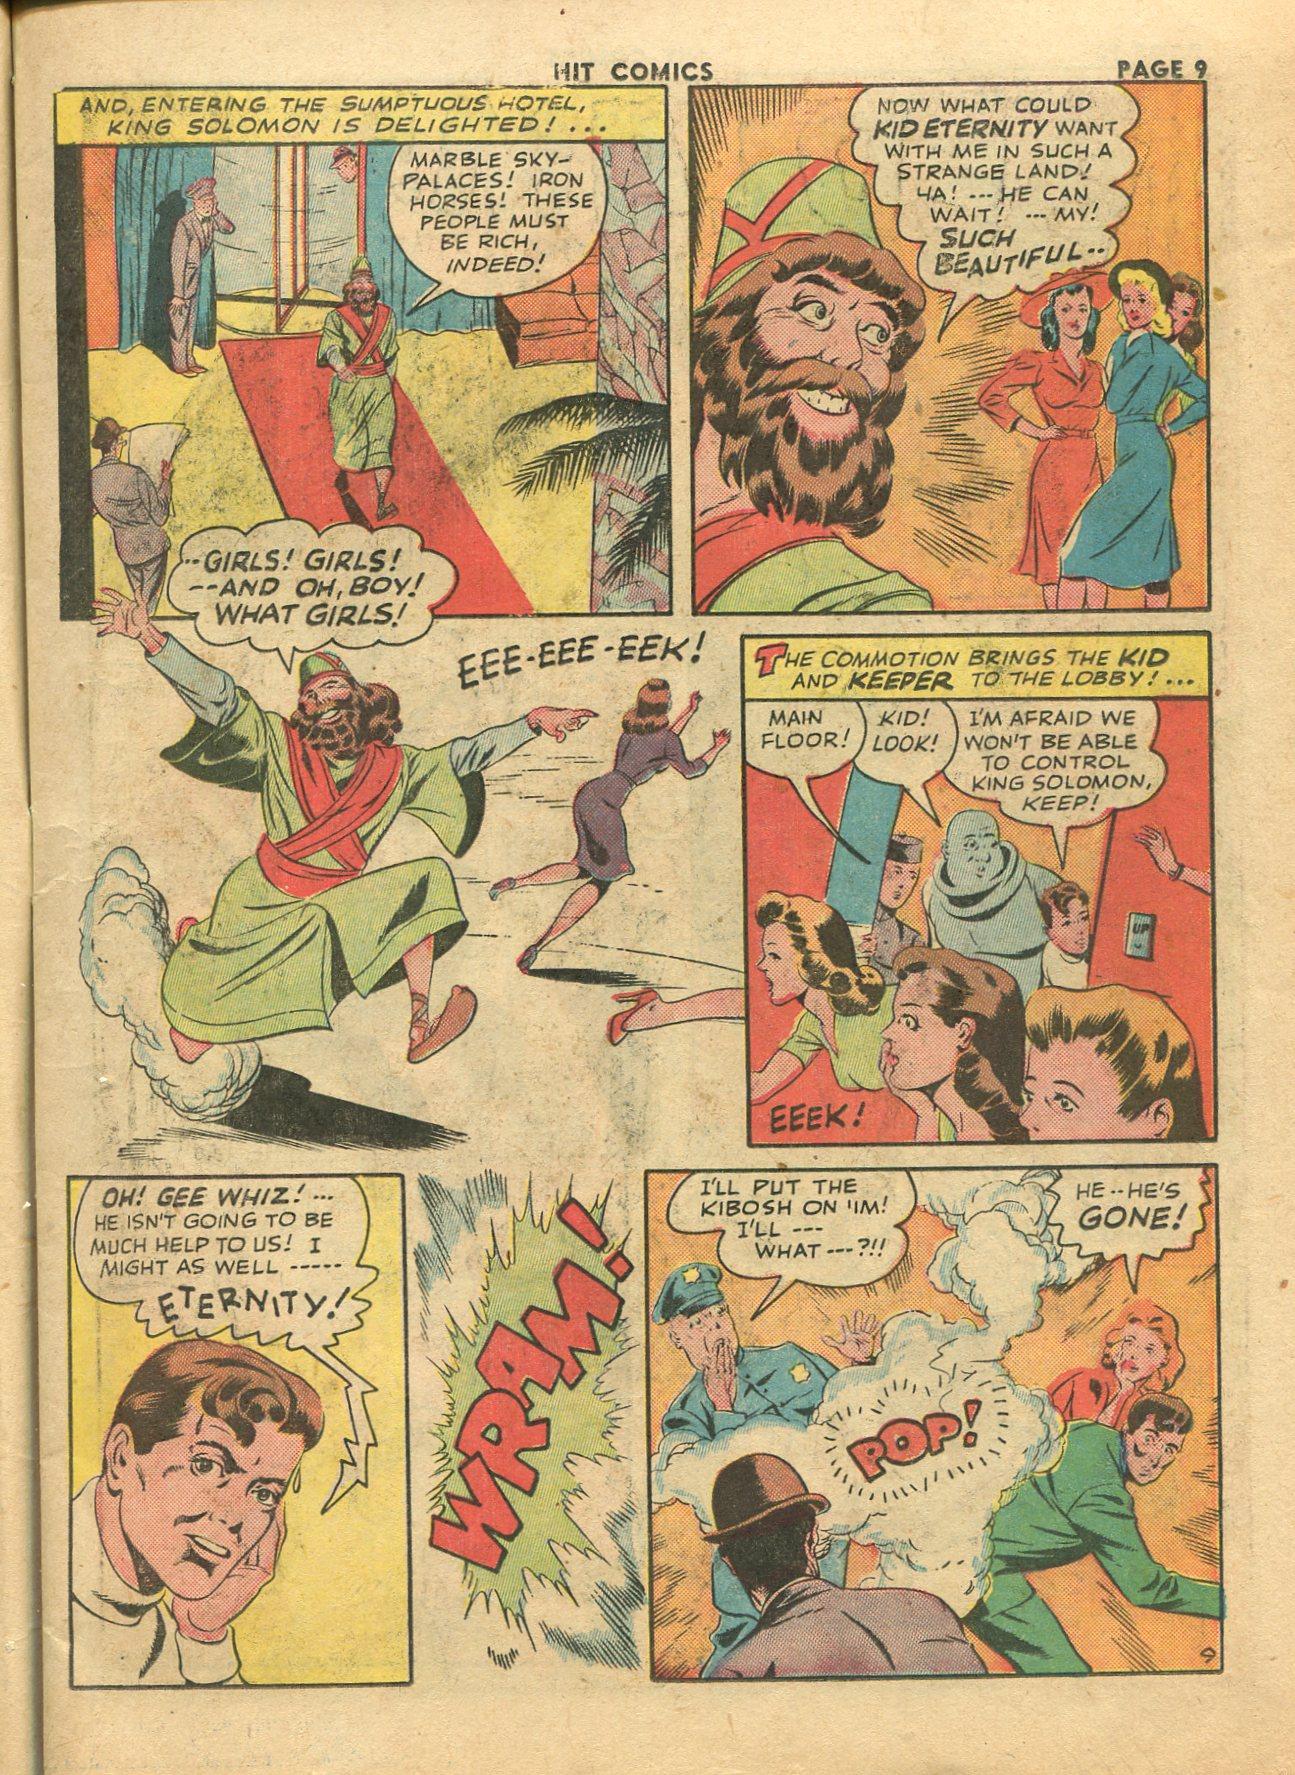 Read online Hit Comics comic -  Issue #28 - 12